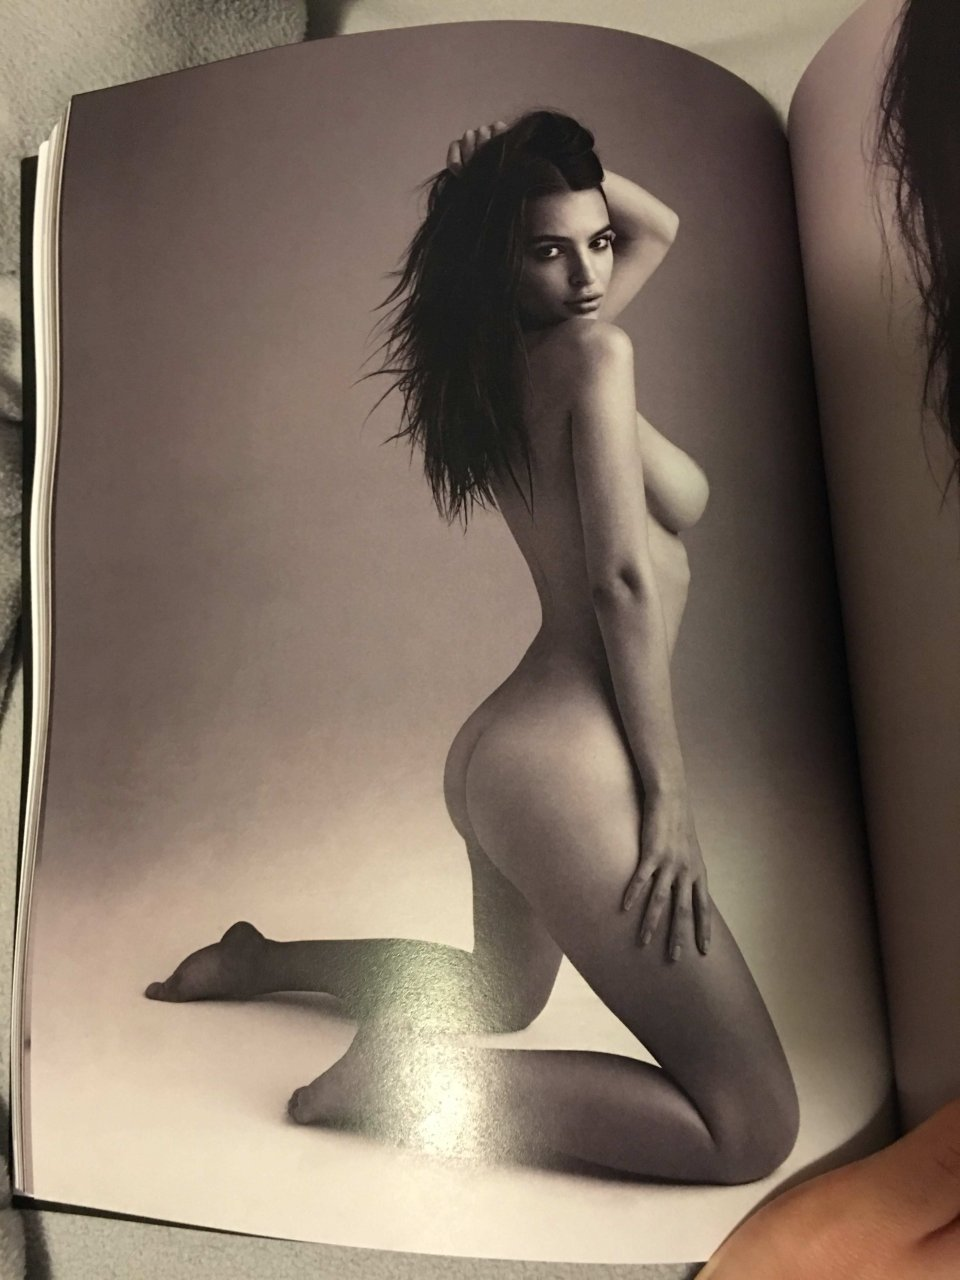 Sanna Backstrom Sexy,Alora li fappening Adult videos Jennifer Love Hewitt Likes The Big Dick -,Cora Keegan Naked - 9 Photos